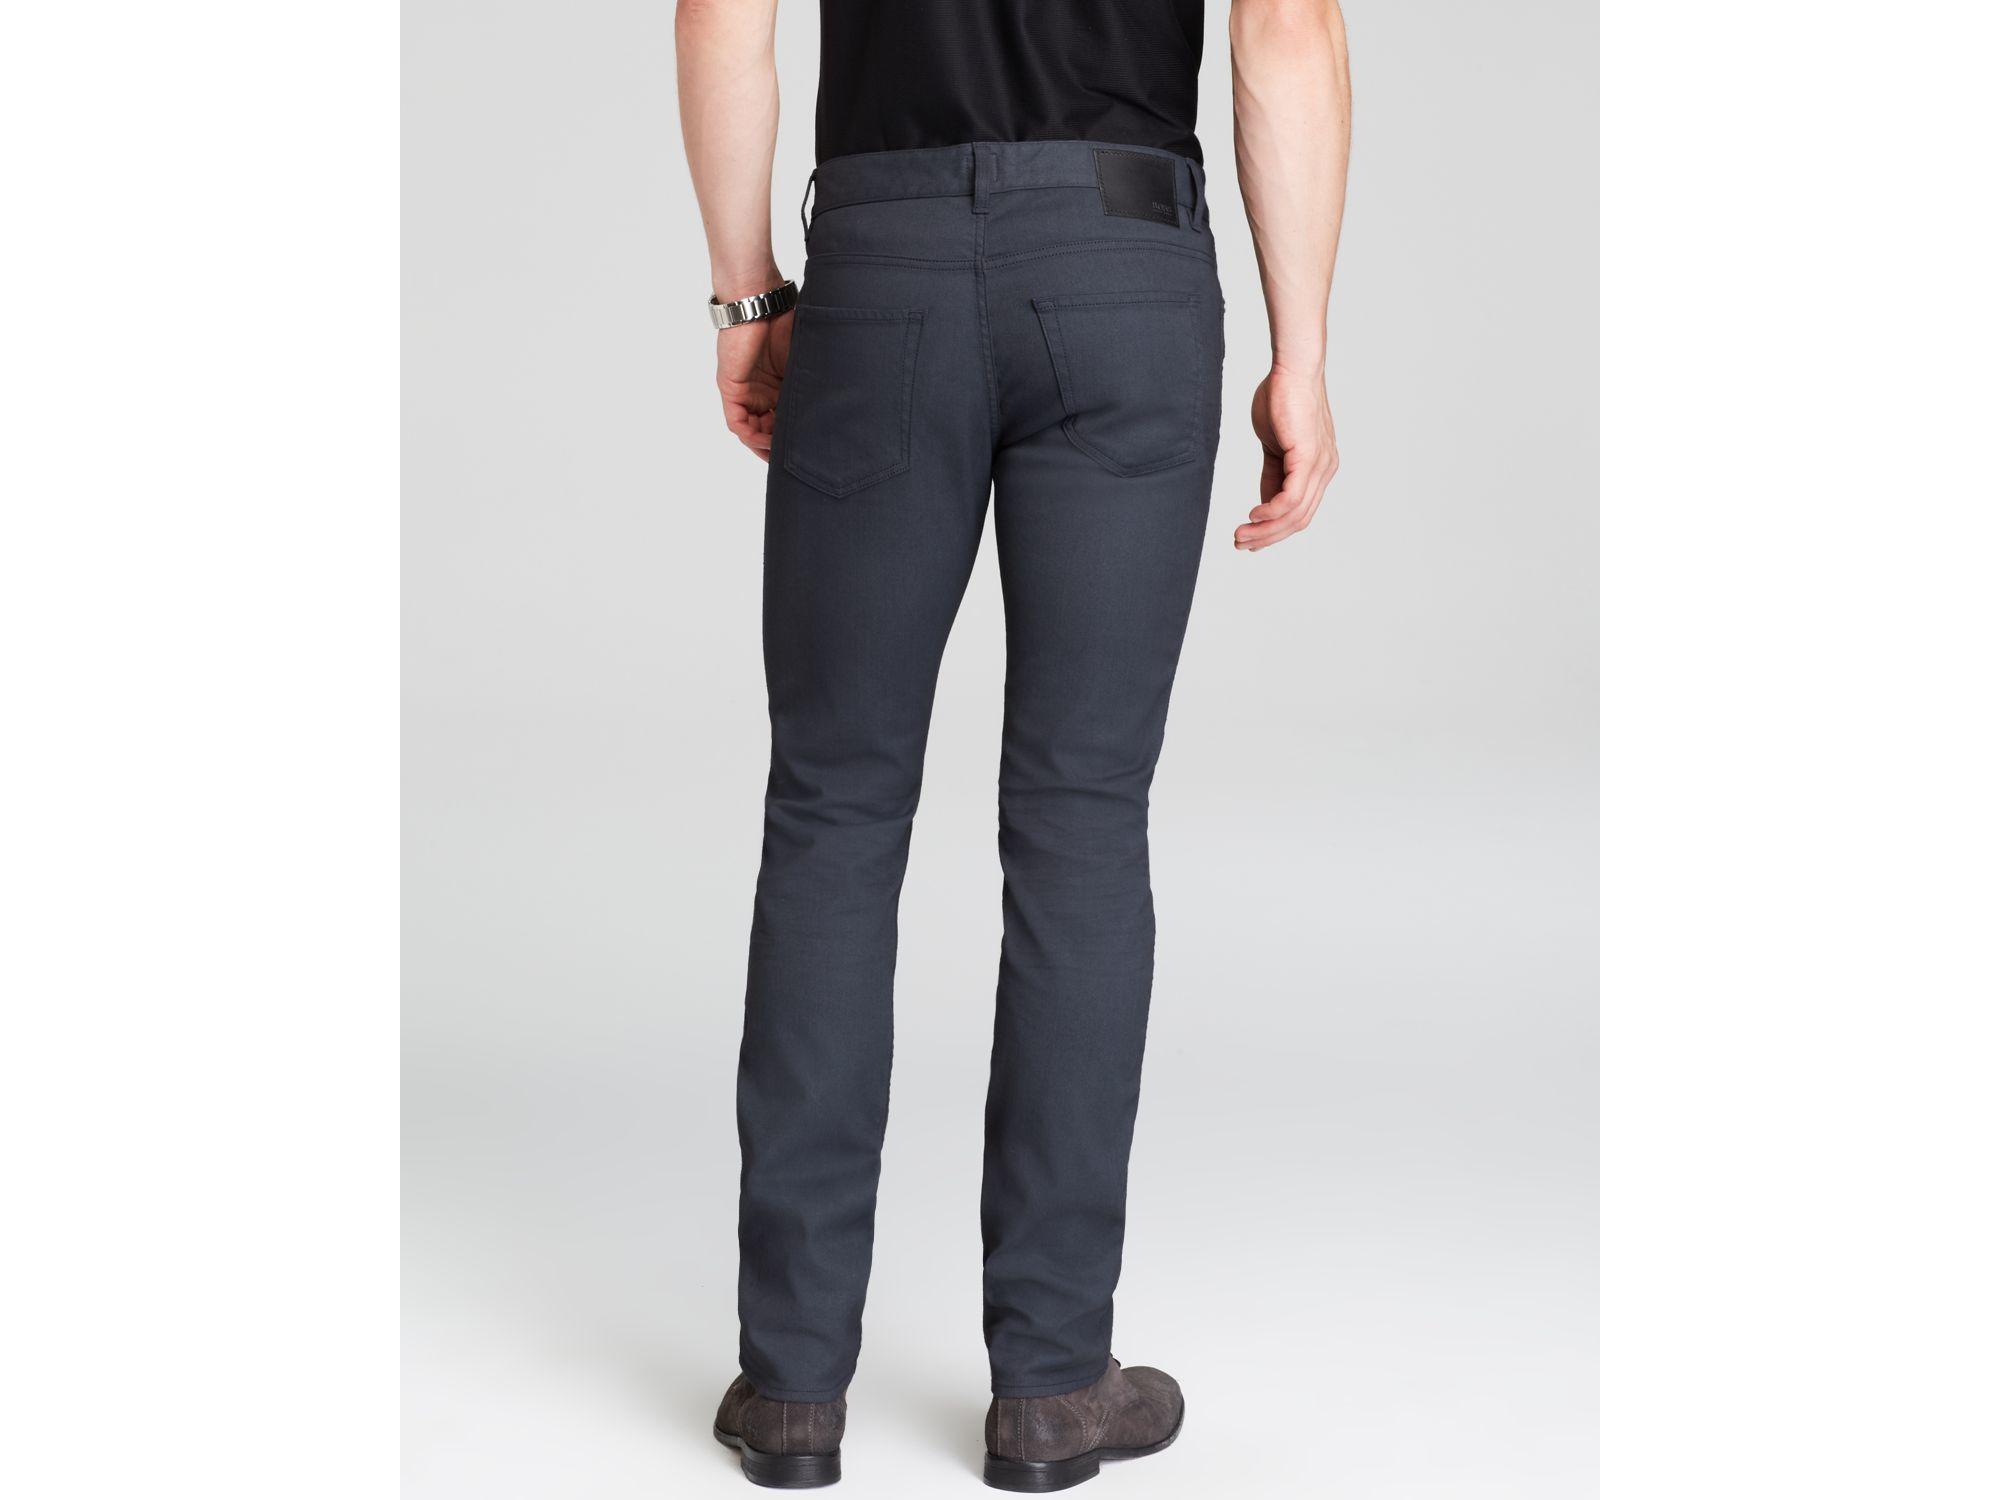 Janes BOSS Hugo Business-Hemd Slim Fit Navy Blue